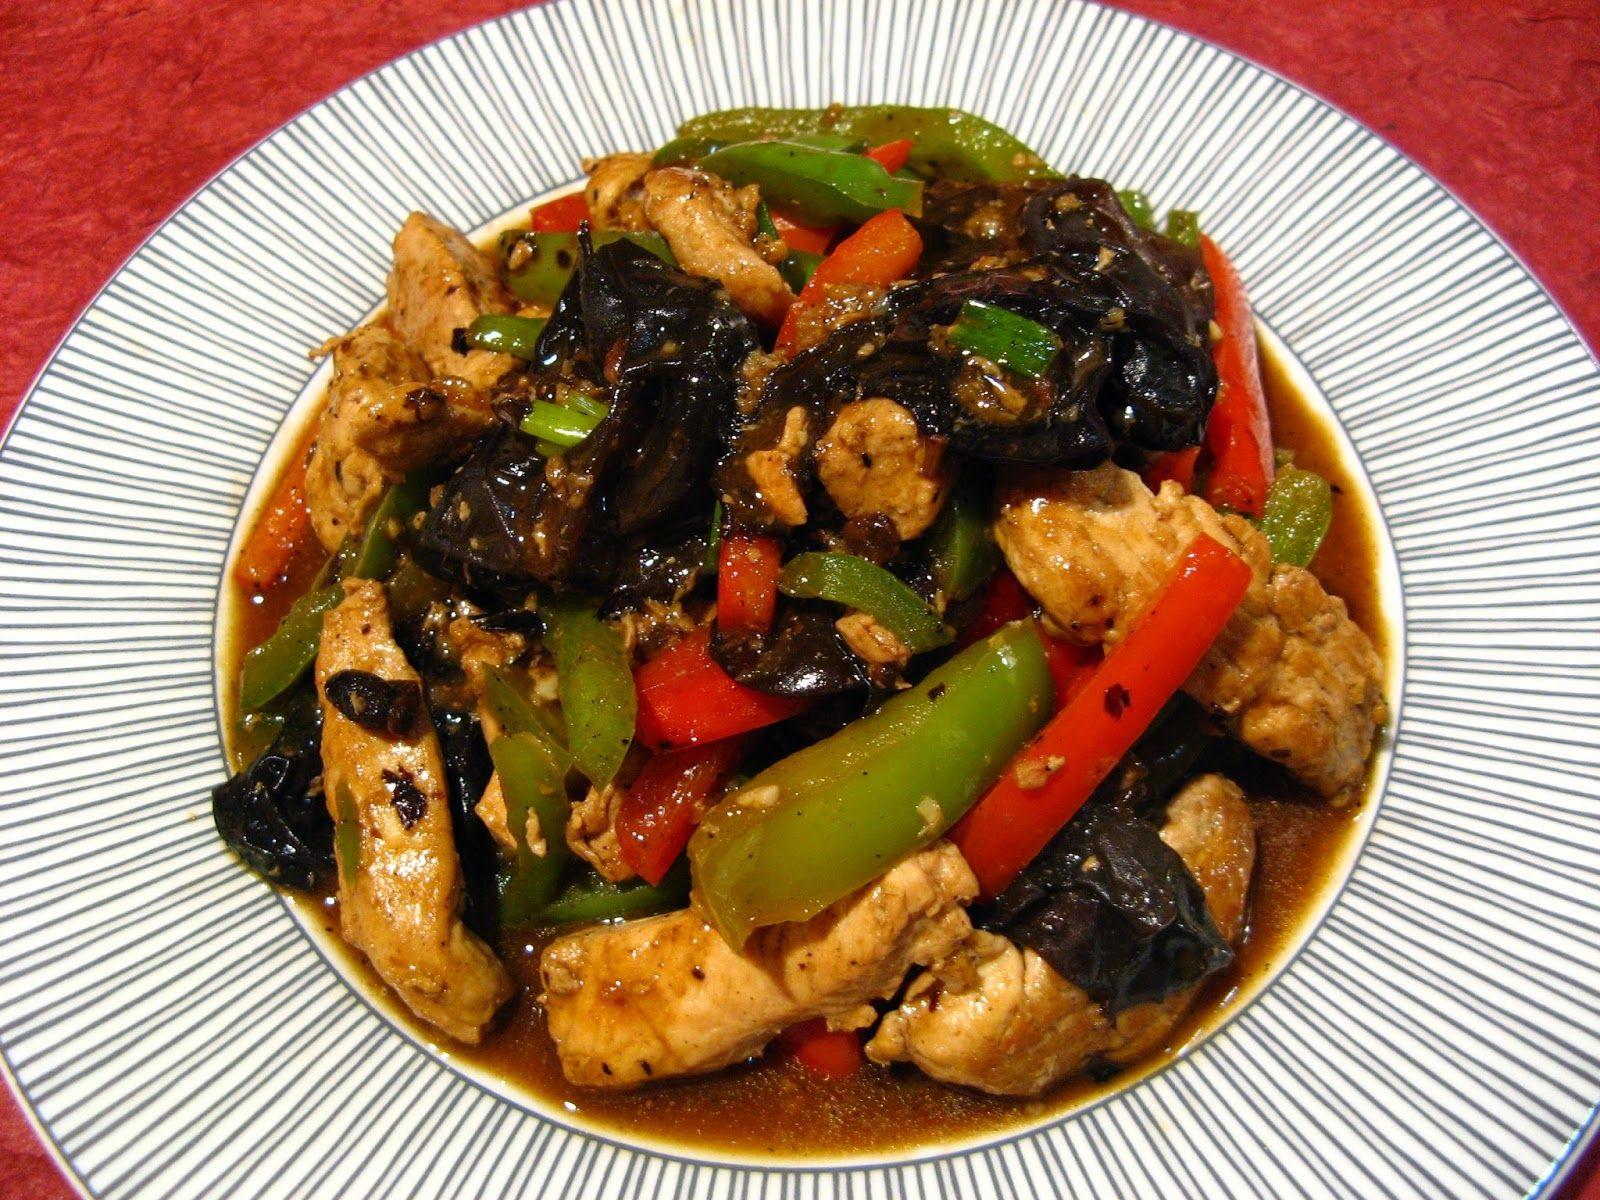 Black Bean Sauce Cloud Ear Chicken (蒜蓉豆豉雲耳雞, Syun3 Jung4 Dau6 Si6 Wan4 Ji5 Gai1)